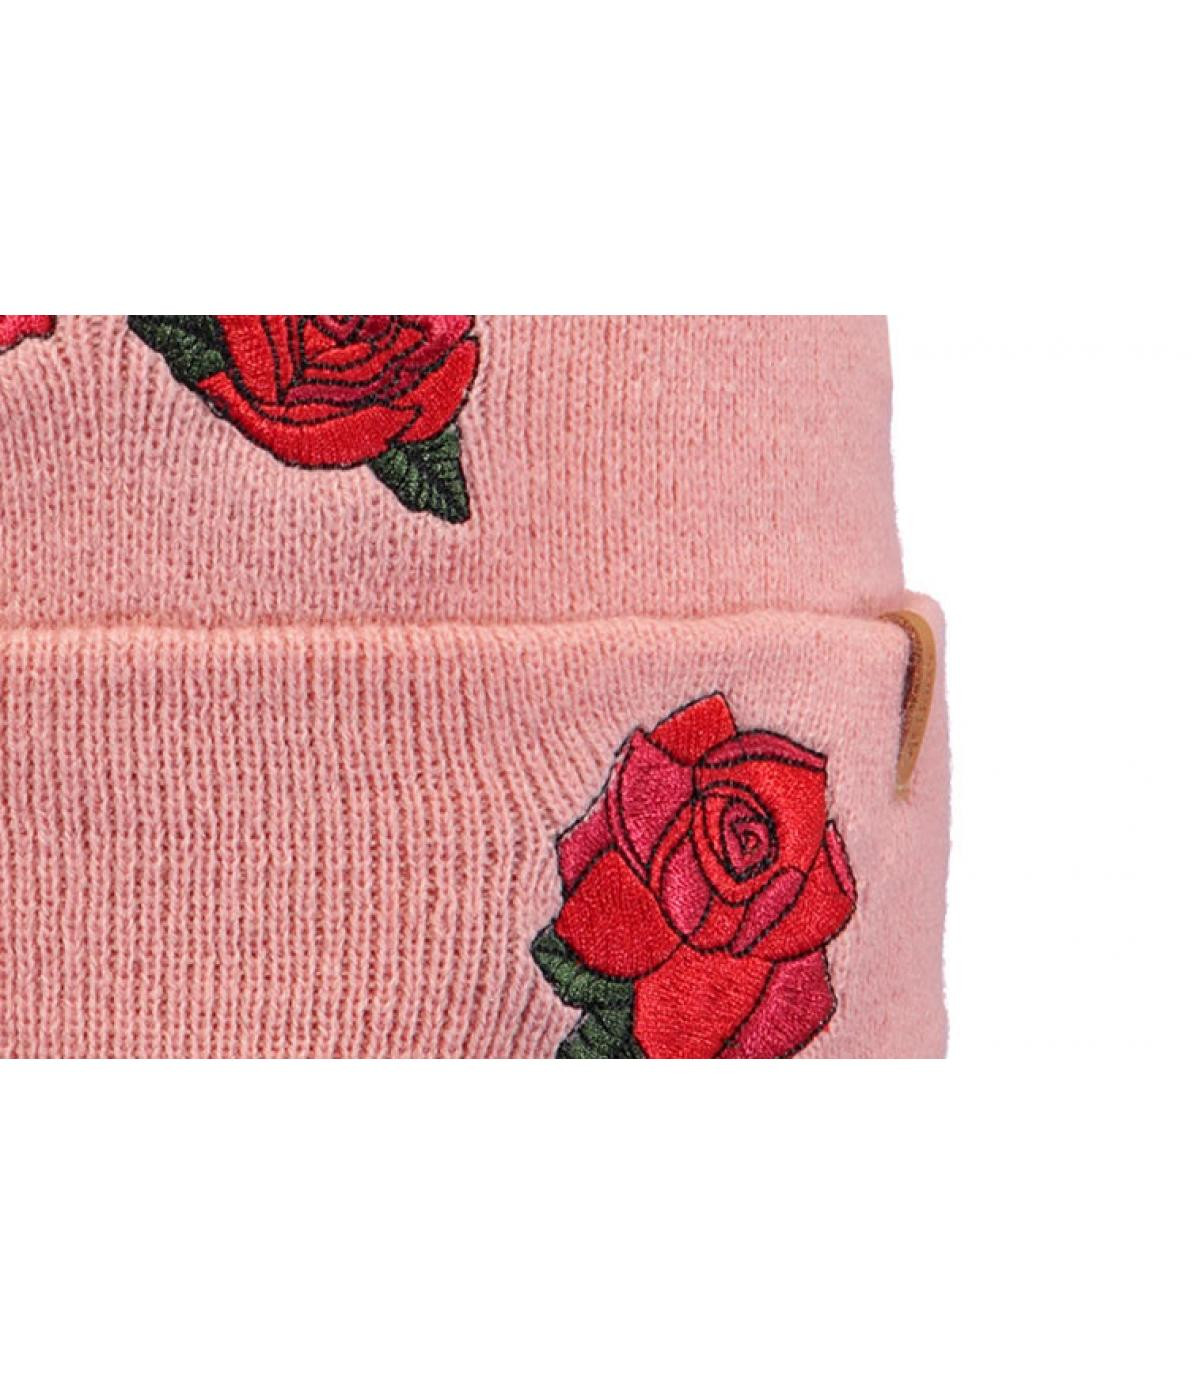 Details Orelis Beanie pink - Abbildung 3